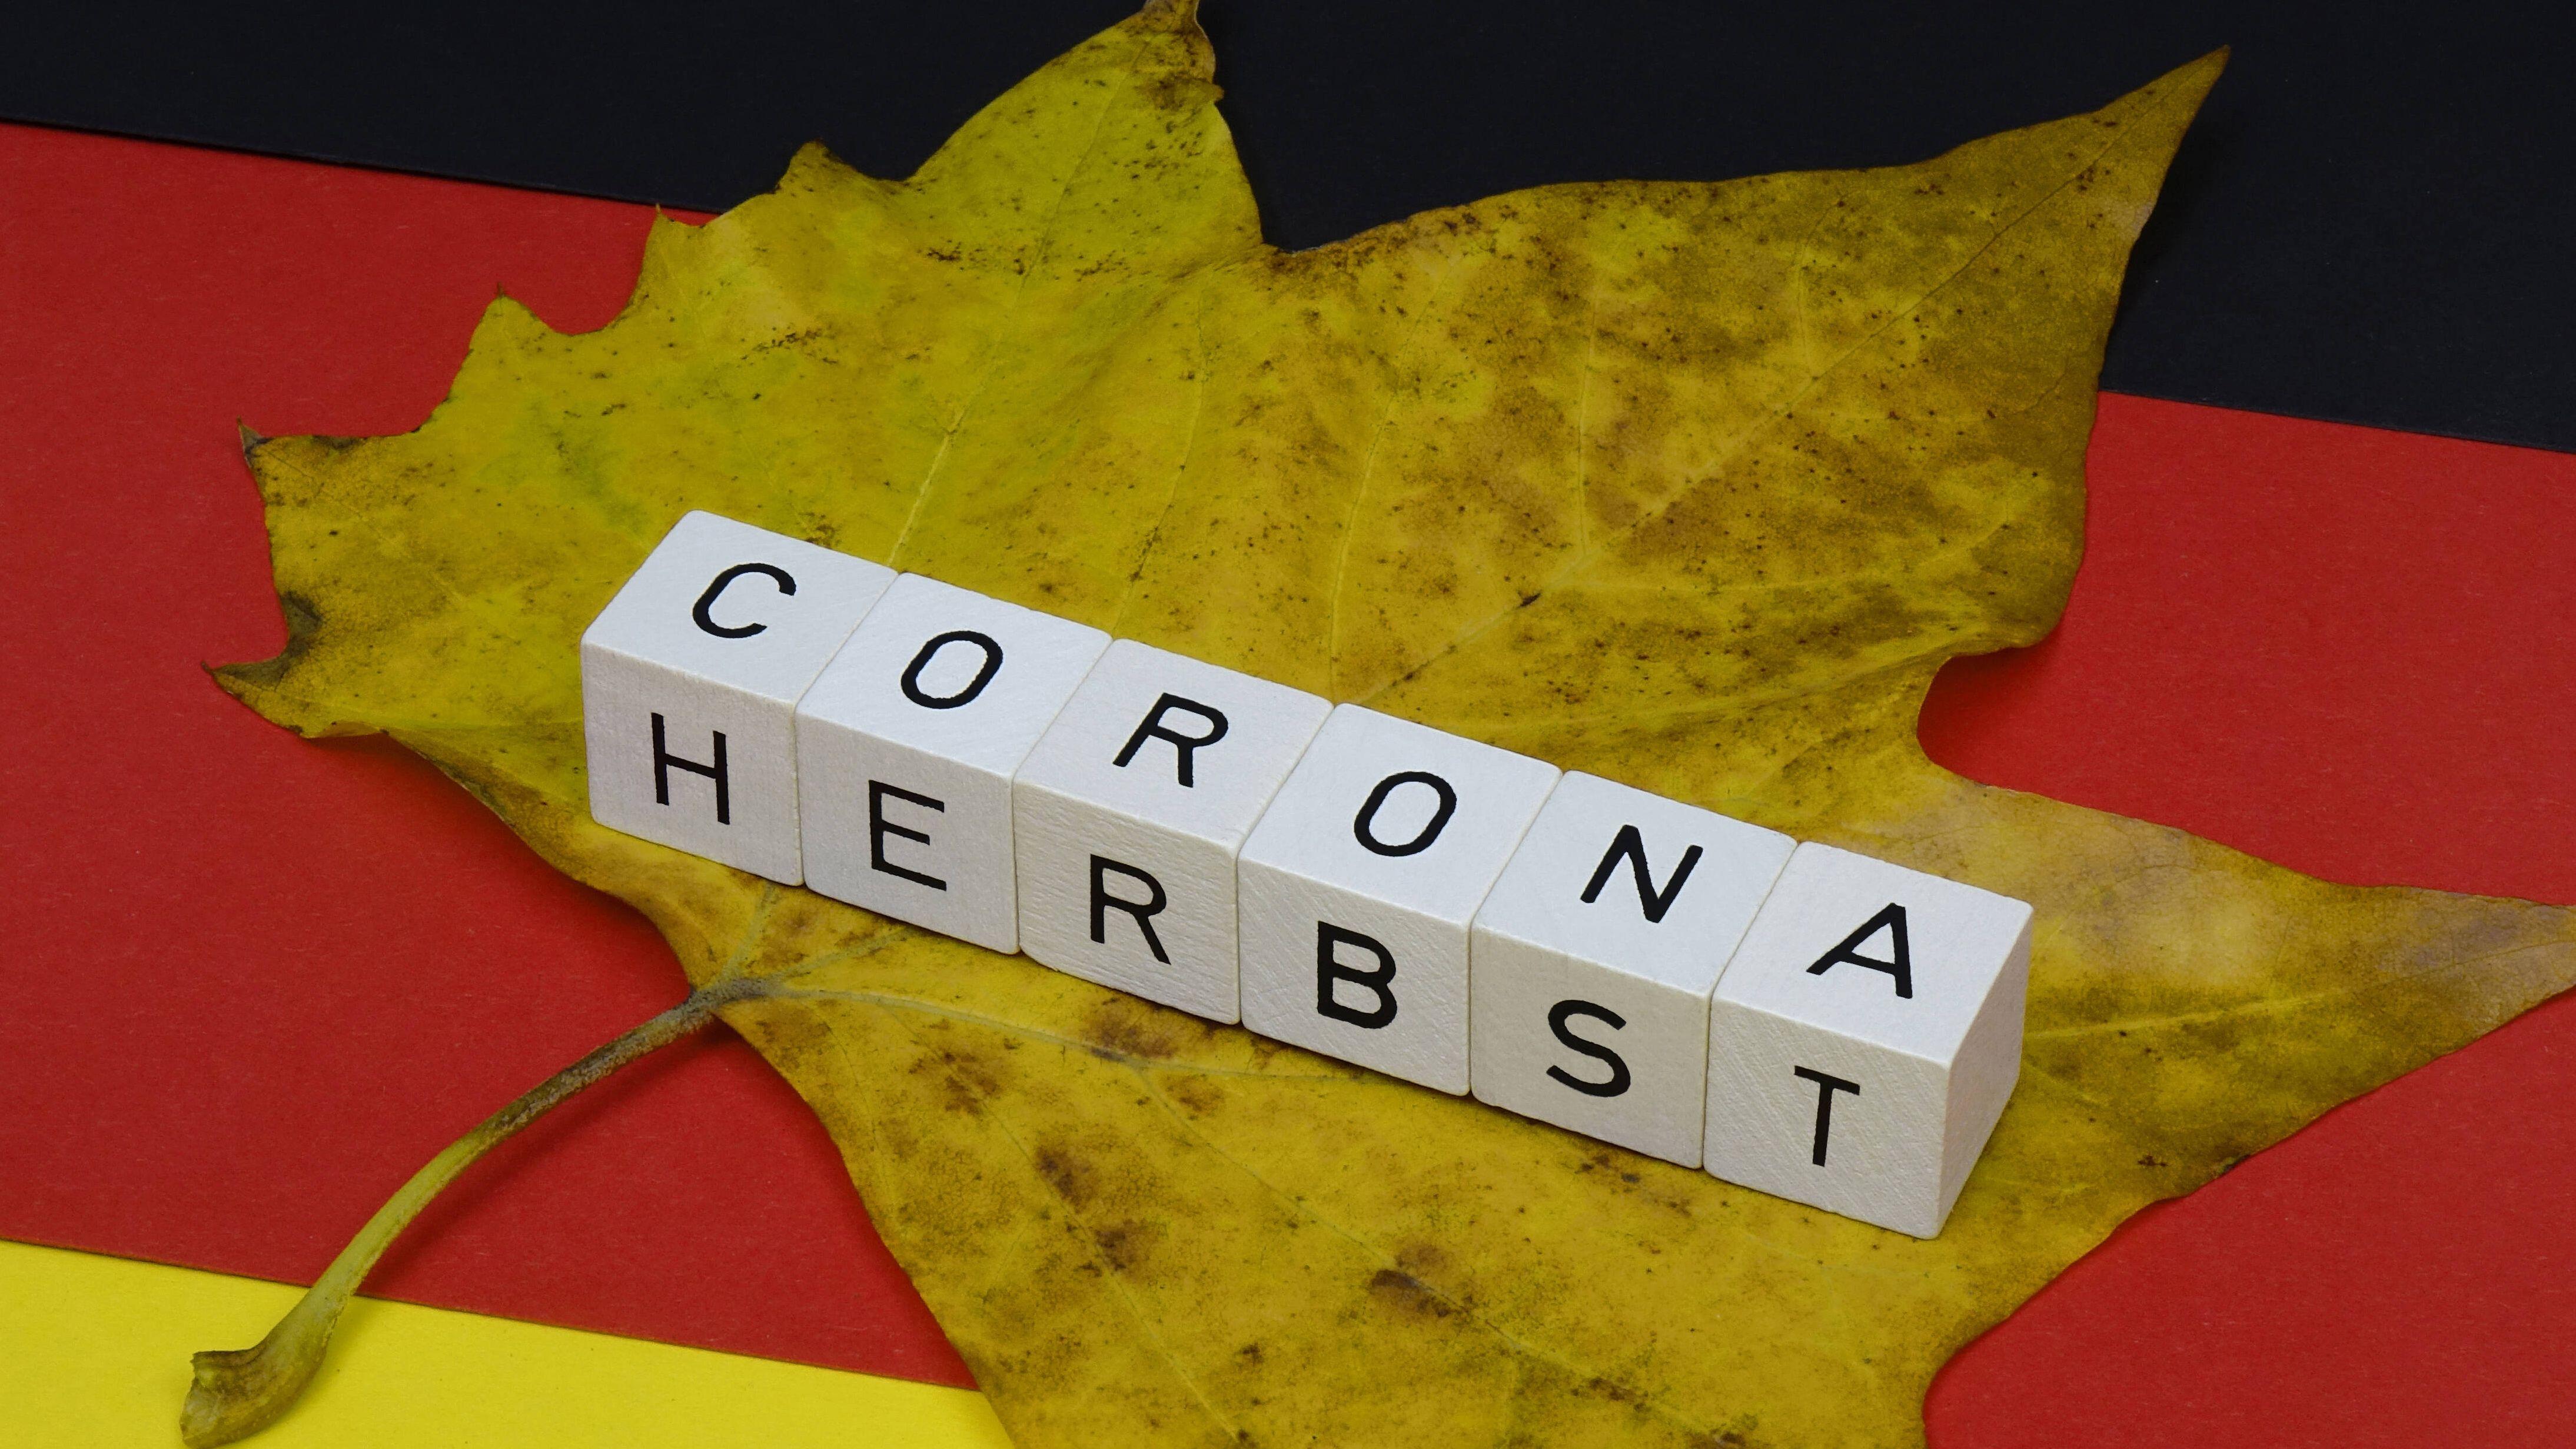 Herbst Corona